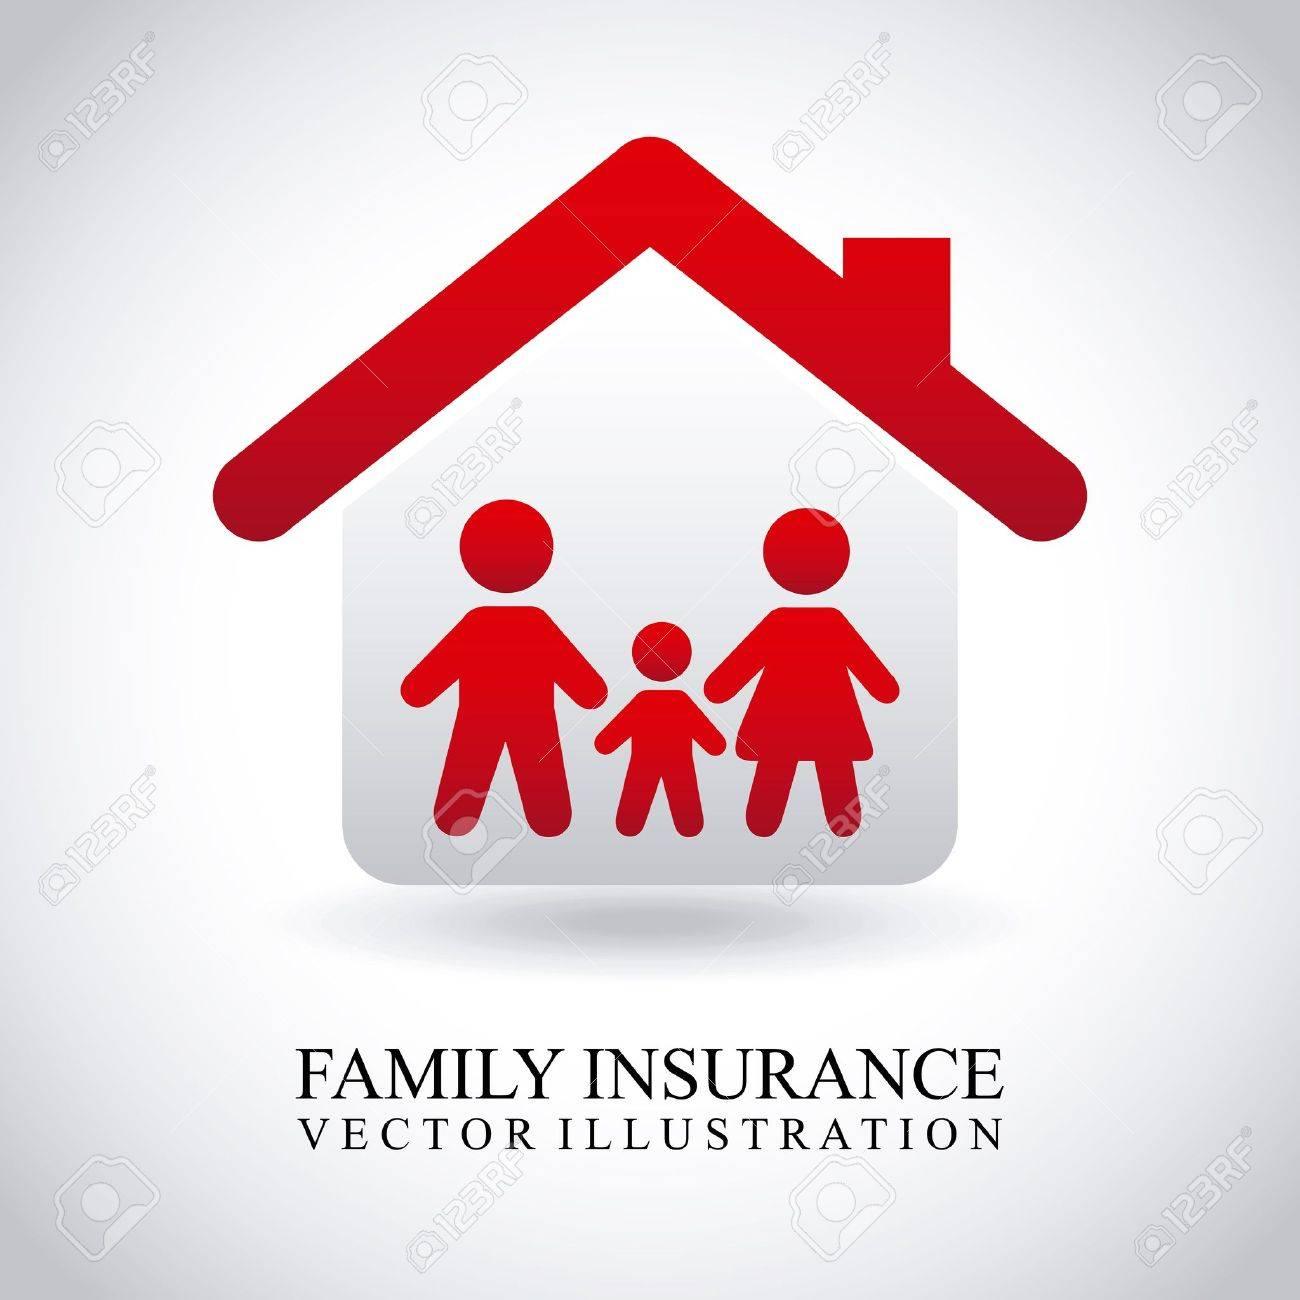 family insurance over gray background Stock Vector - 21287097